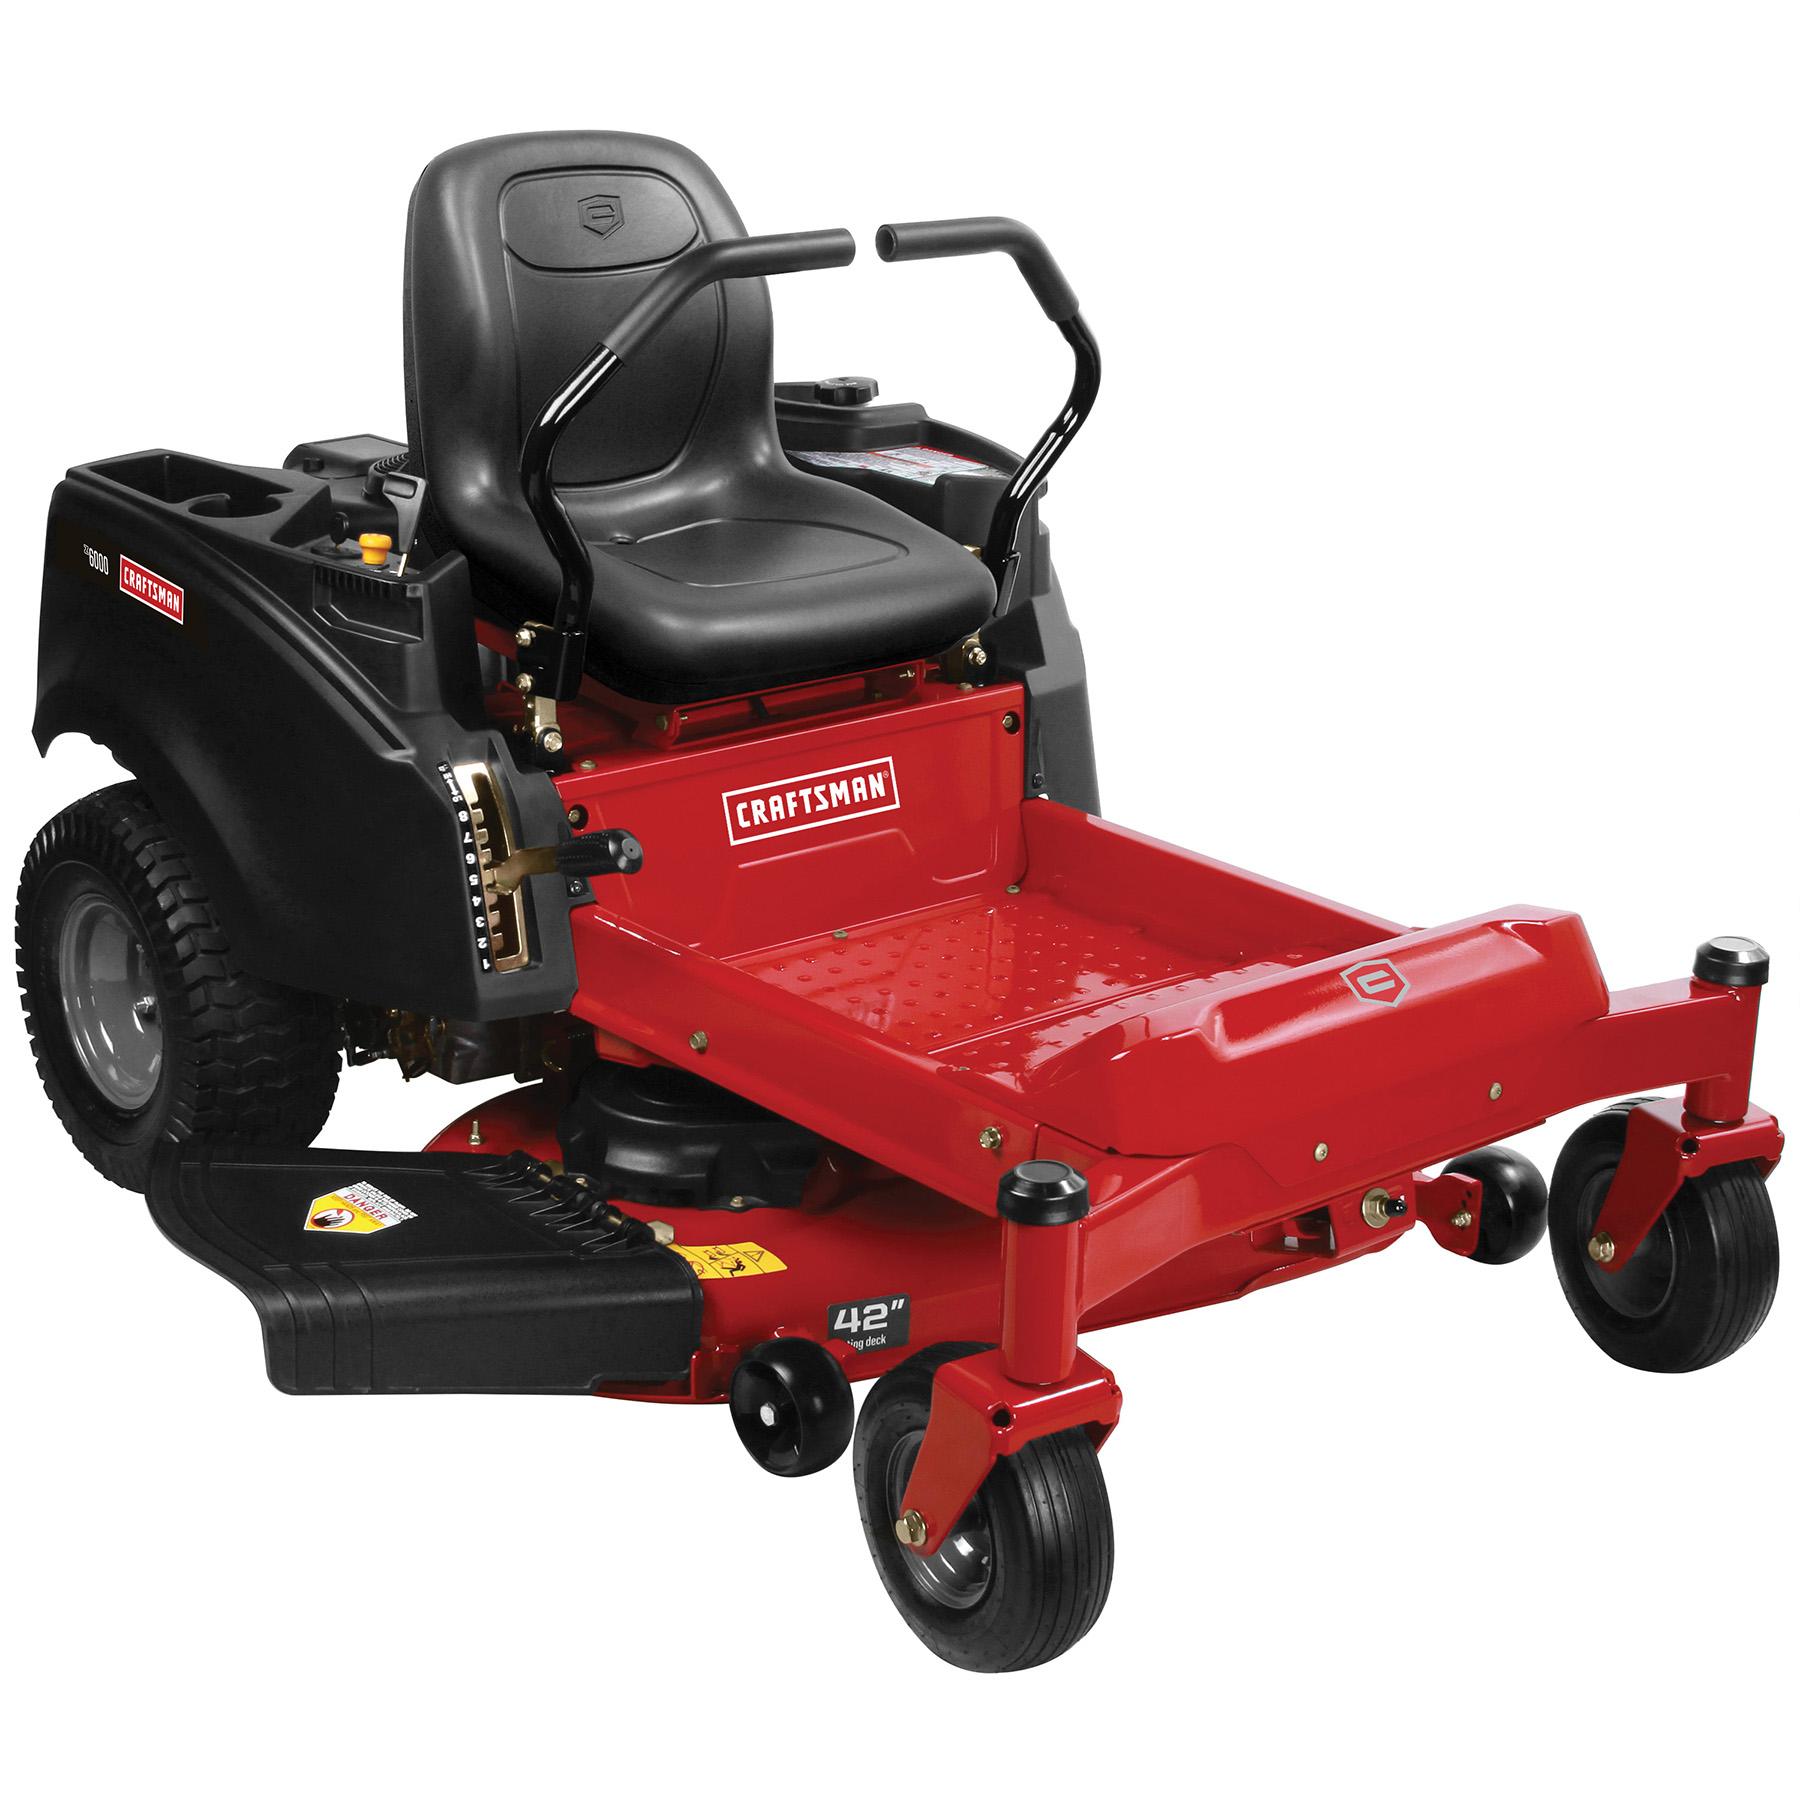 small resolution of craftsman 20411 42 22 hp v twin briggs stratton zero turn riding mower